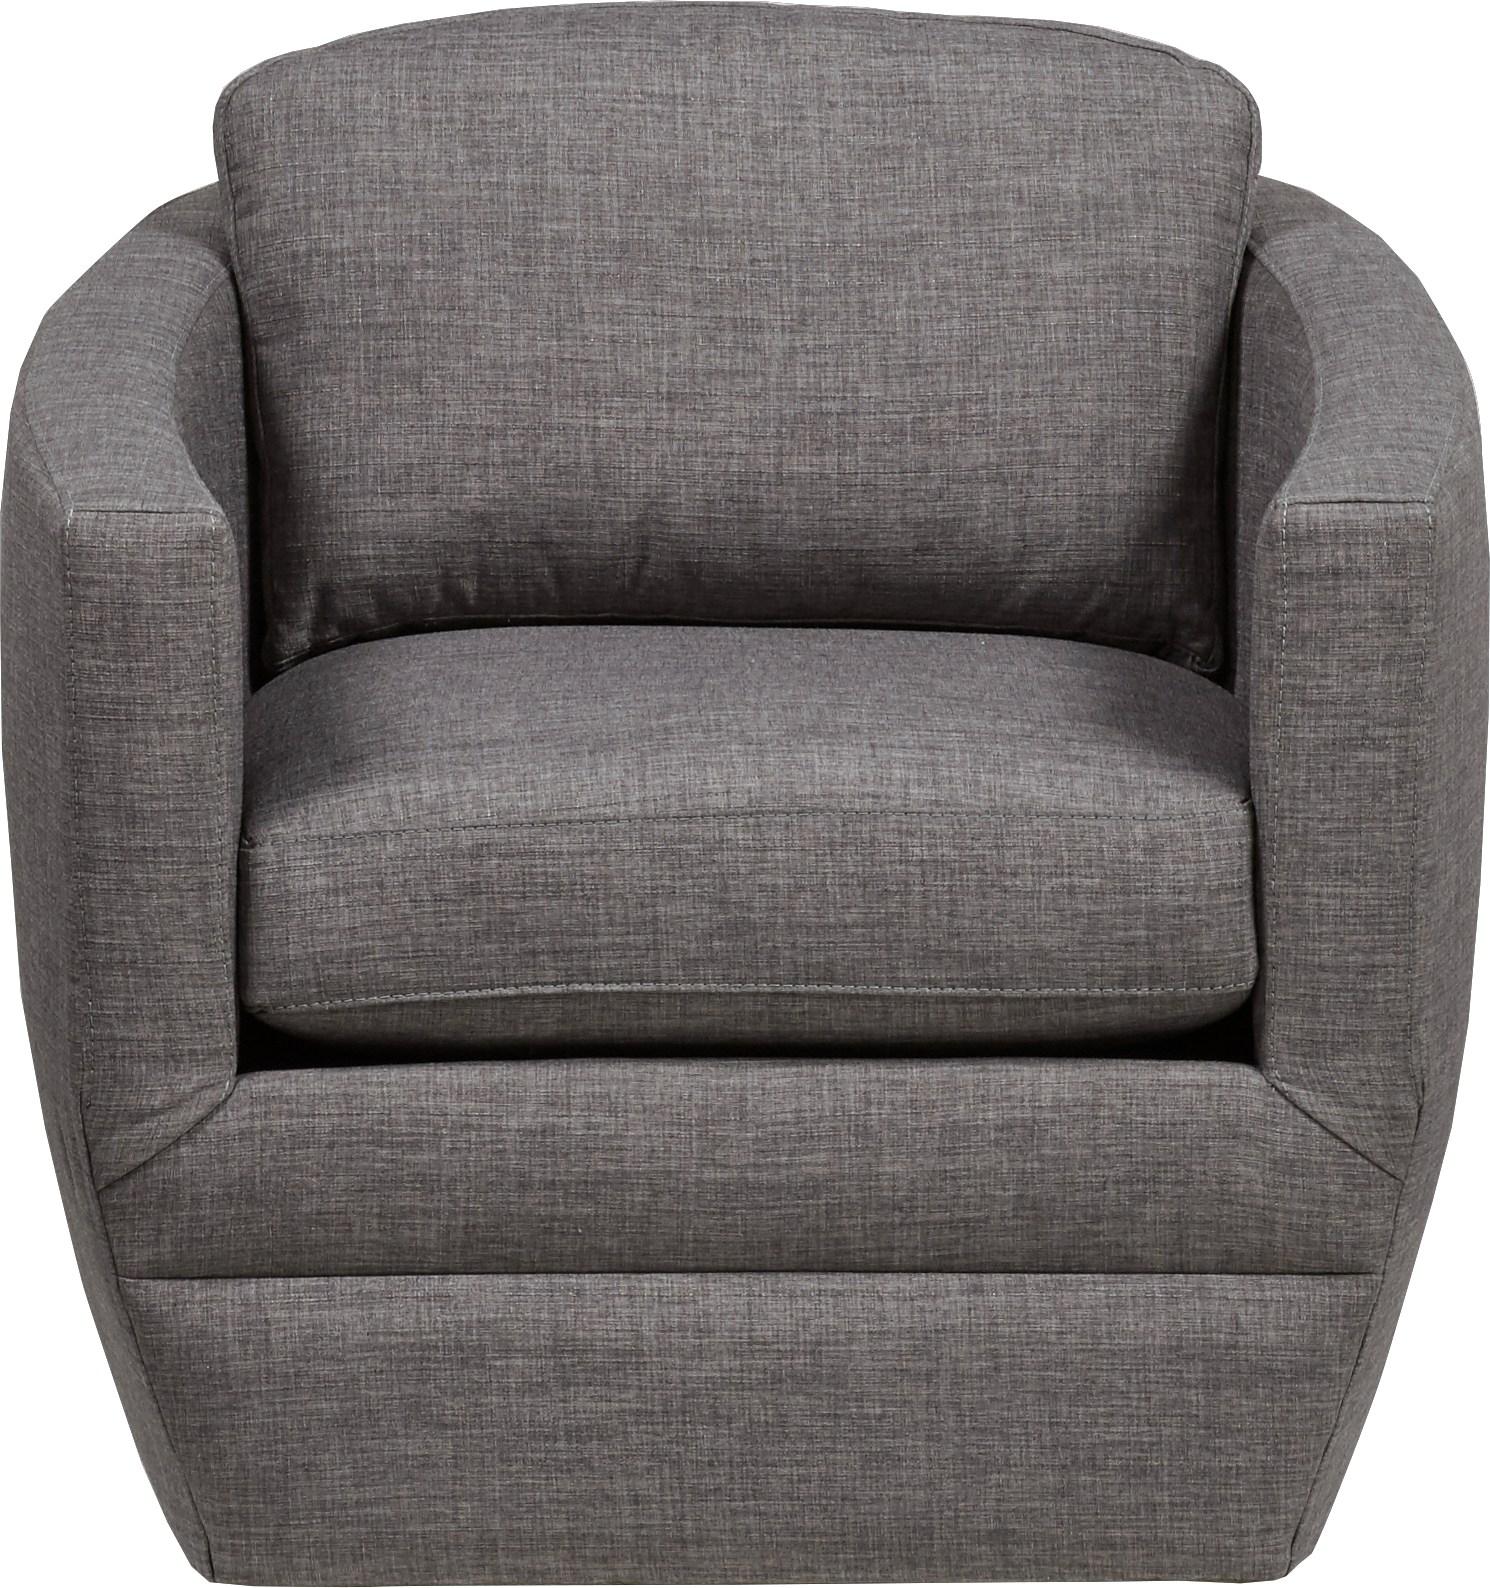 Harbour City San Marino Dark Gray Swivel Chair - Chairs (Gray) within Dark Grey Swivel Chairs